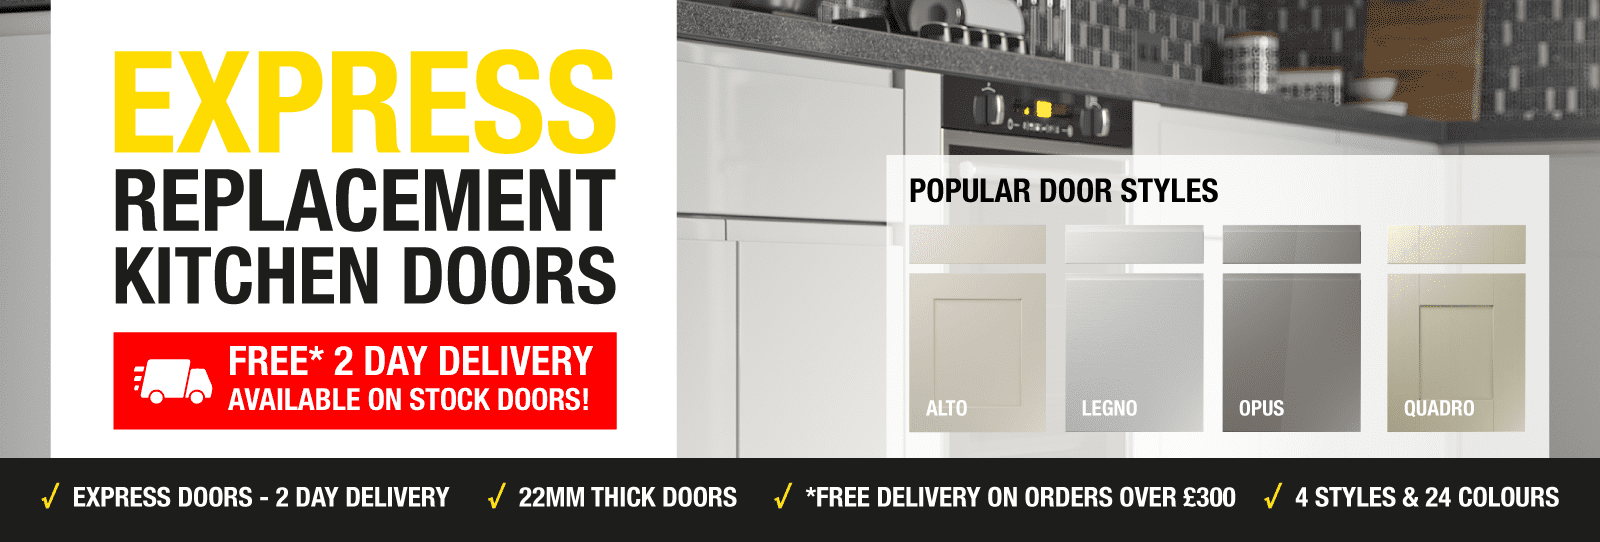 Express Replacement Kitchen Doors